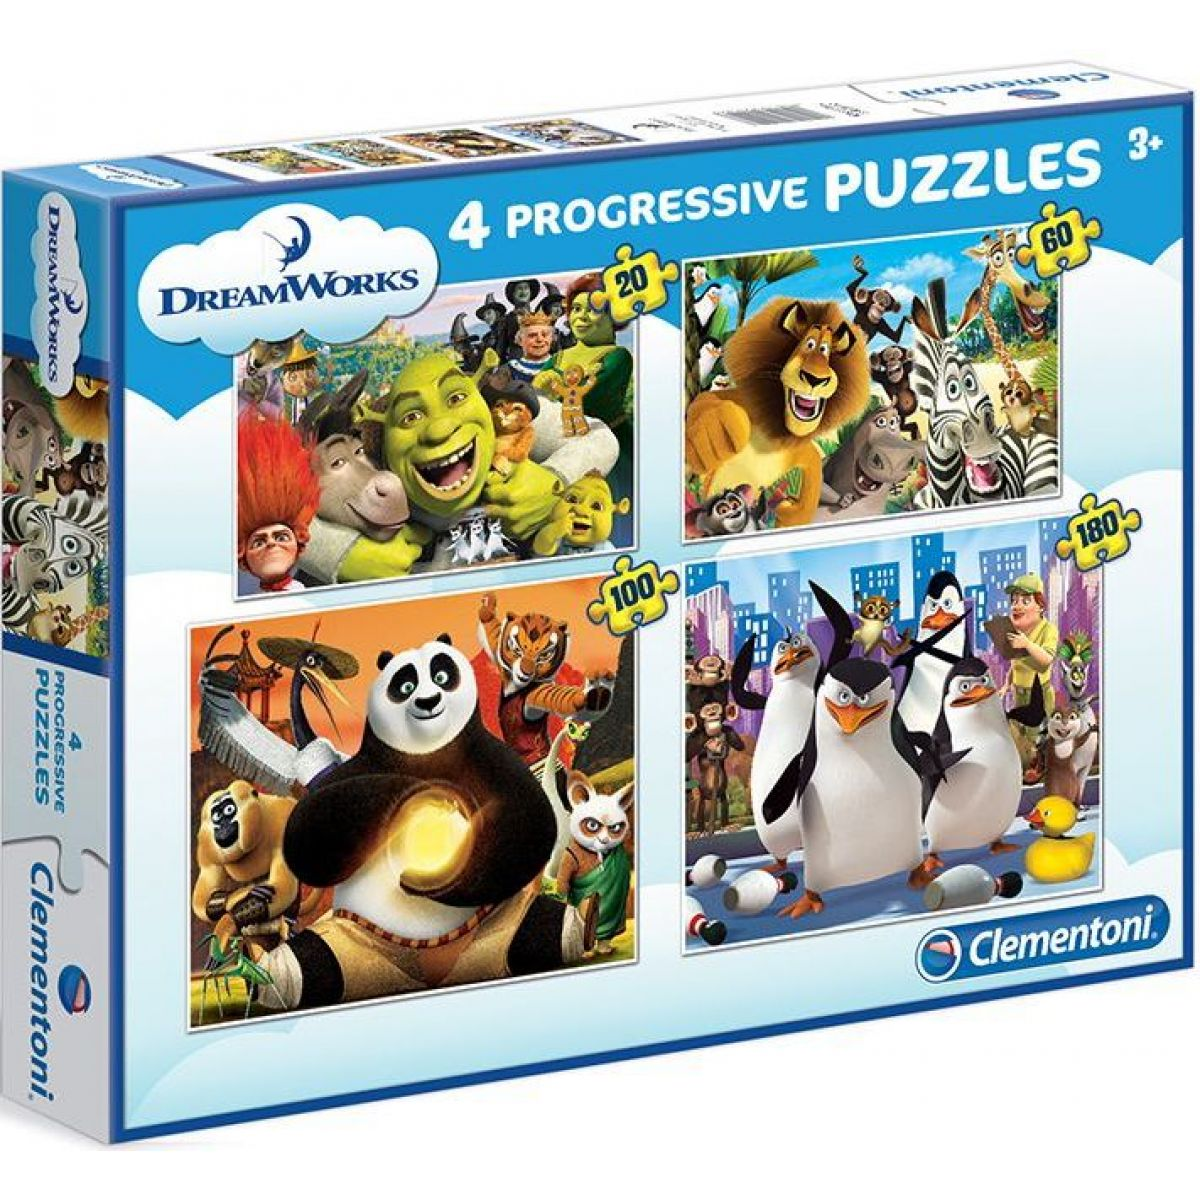 Clementoni Puzzle Progressive 4 v 1 Dreamworks